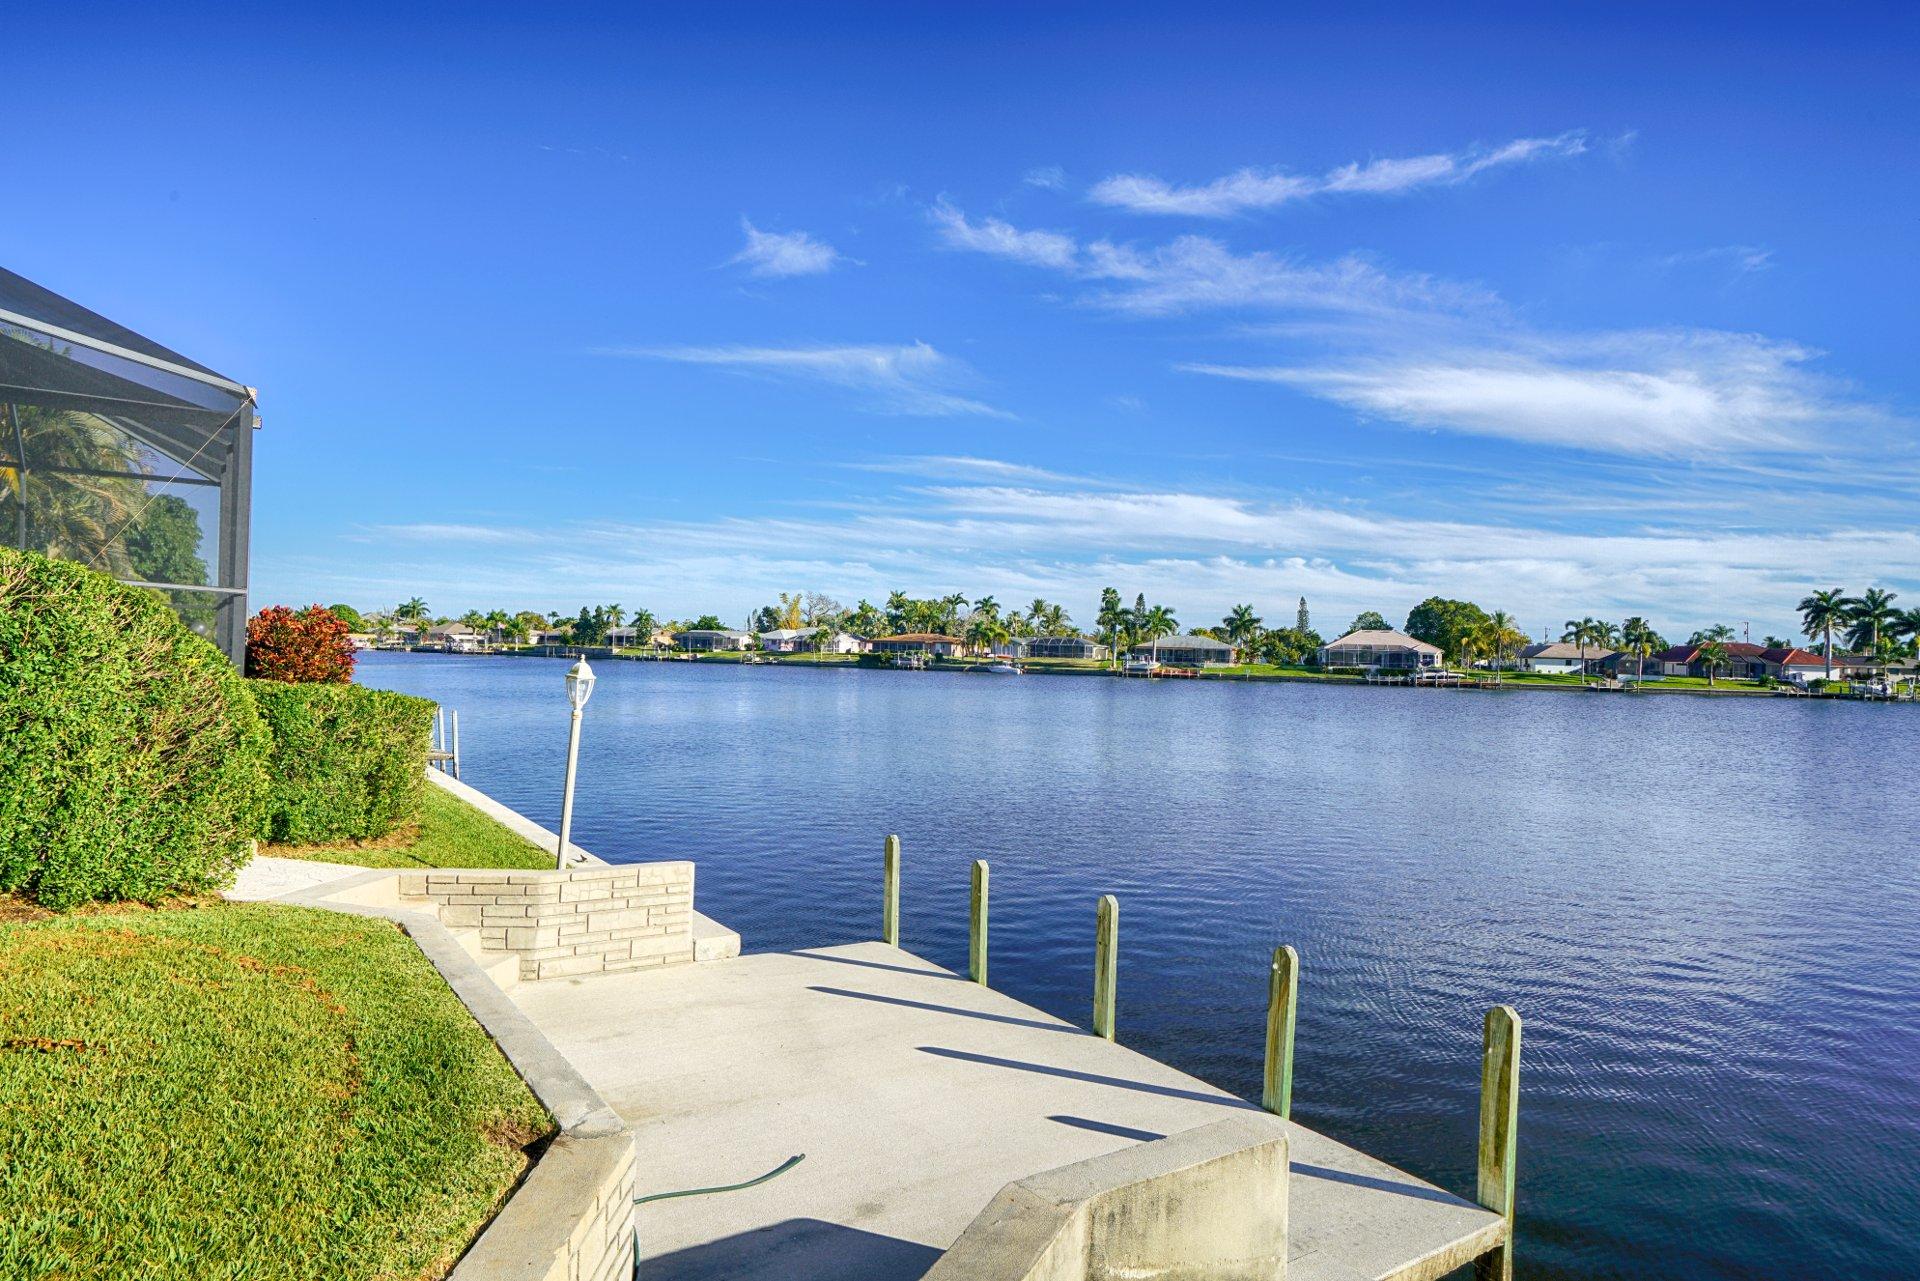 villa blue lagoon new ferienvilla in florida. Black Bedroom Furniture Sets. Home Design Ideas